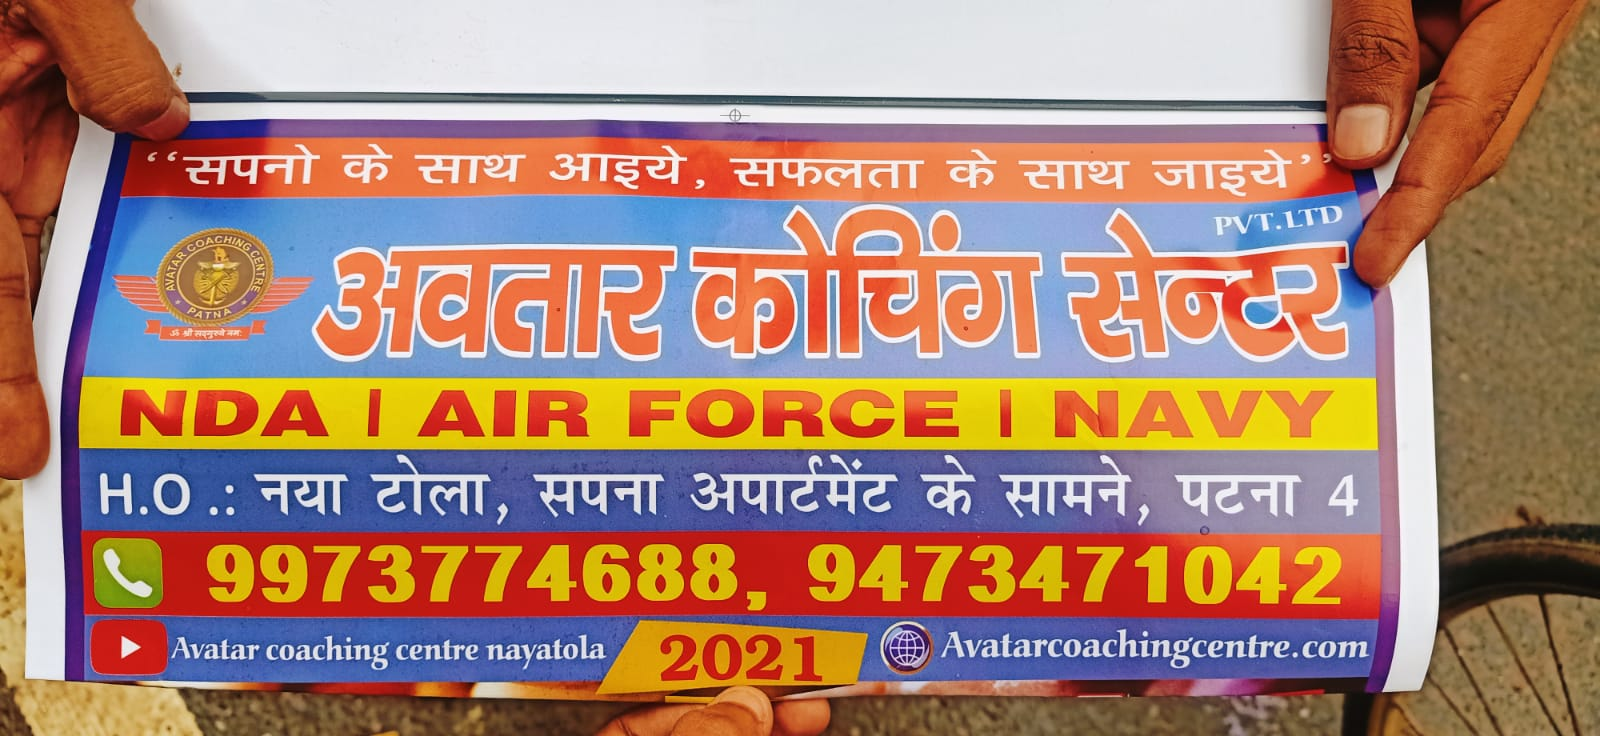 AVATAR COACHING CENTRE Logo